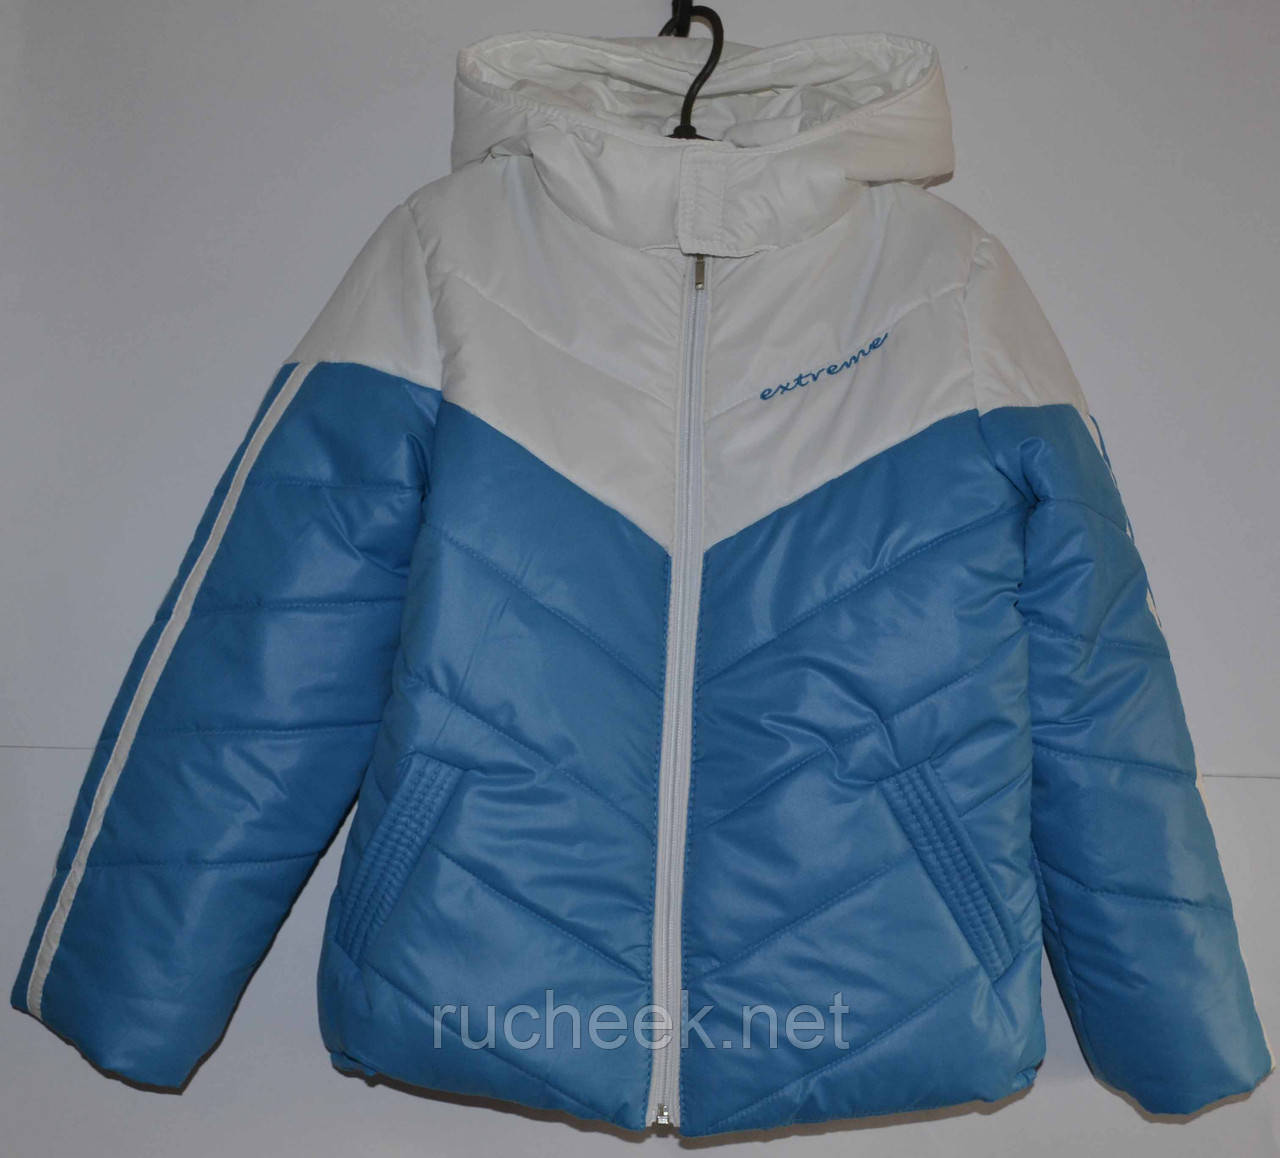 Куртка демисезонная на мальчика р-р 134, ТМ Одягайко